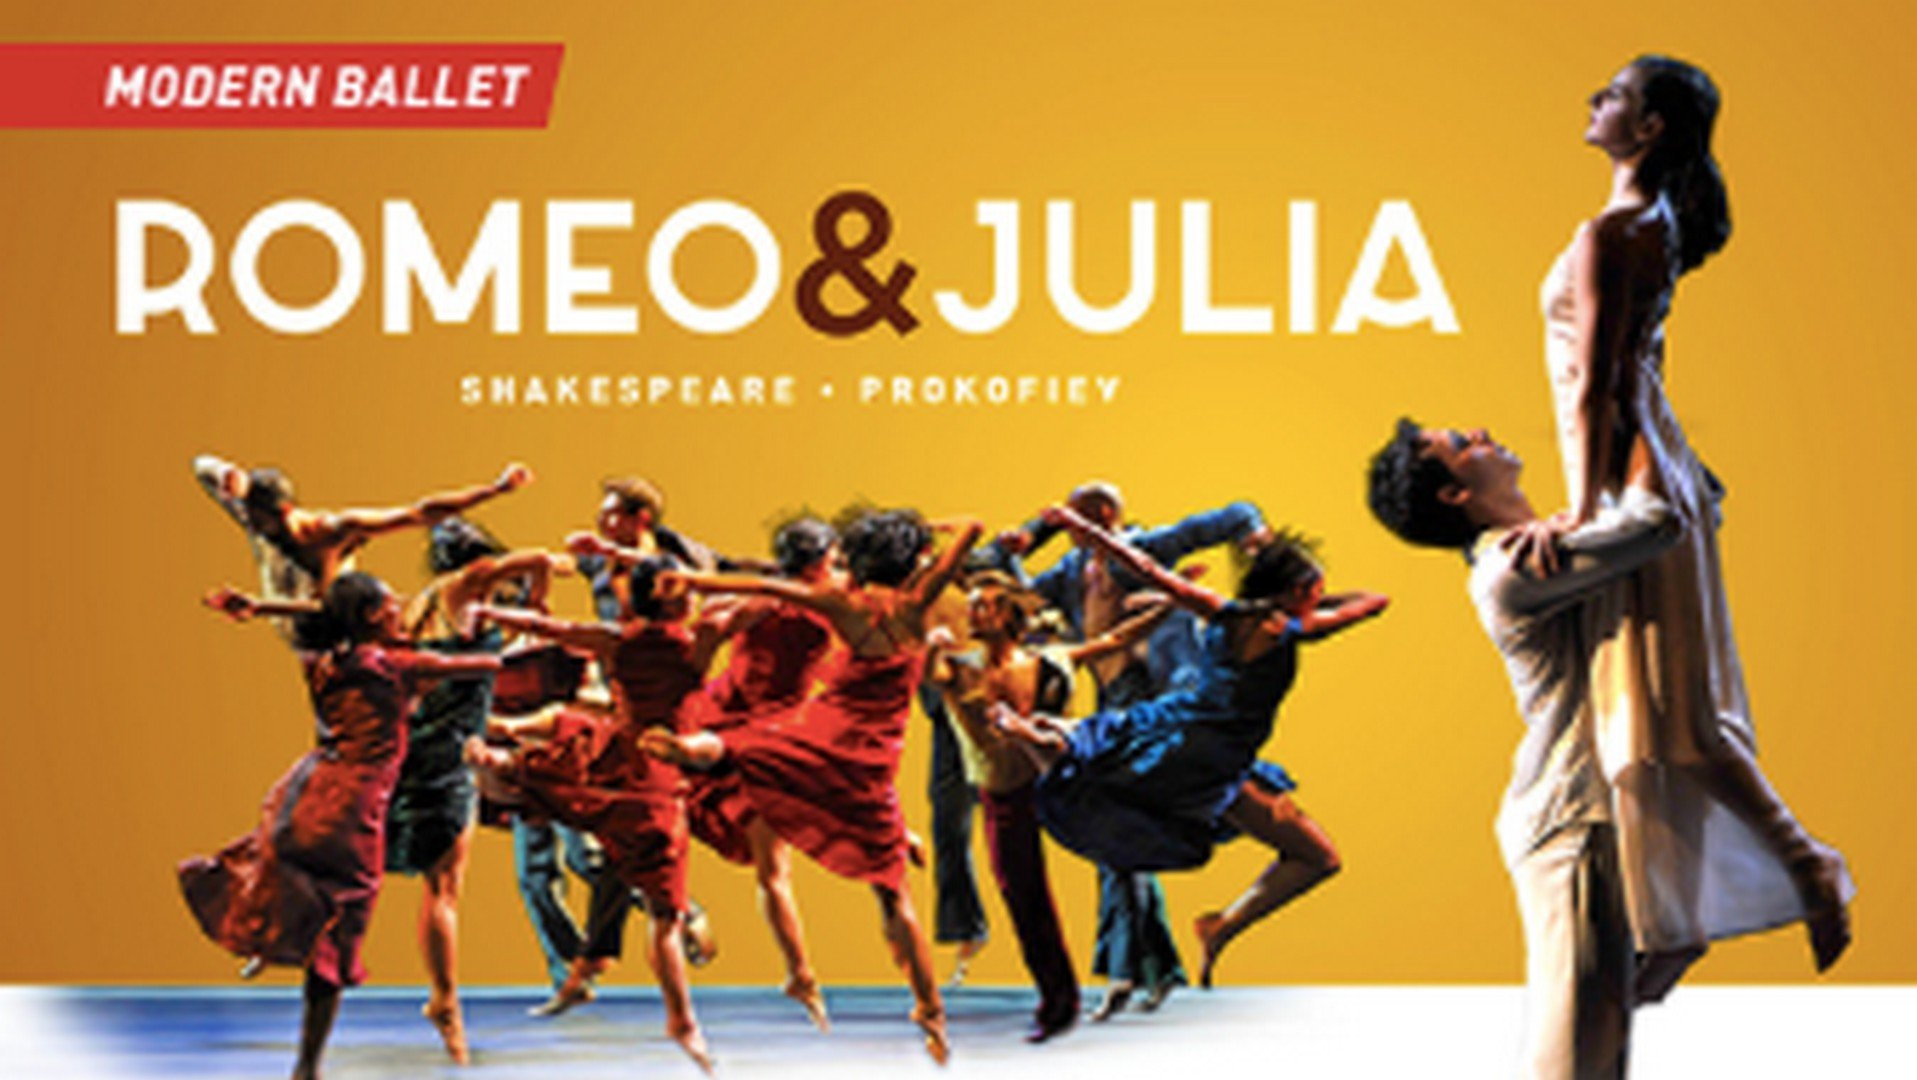 Music Hall Classics en Ballet du Grand Théâtre de Genève brengen  'Romeo & Julia'  als modern dansspektakel - Romeo en Julia 1